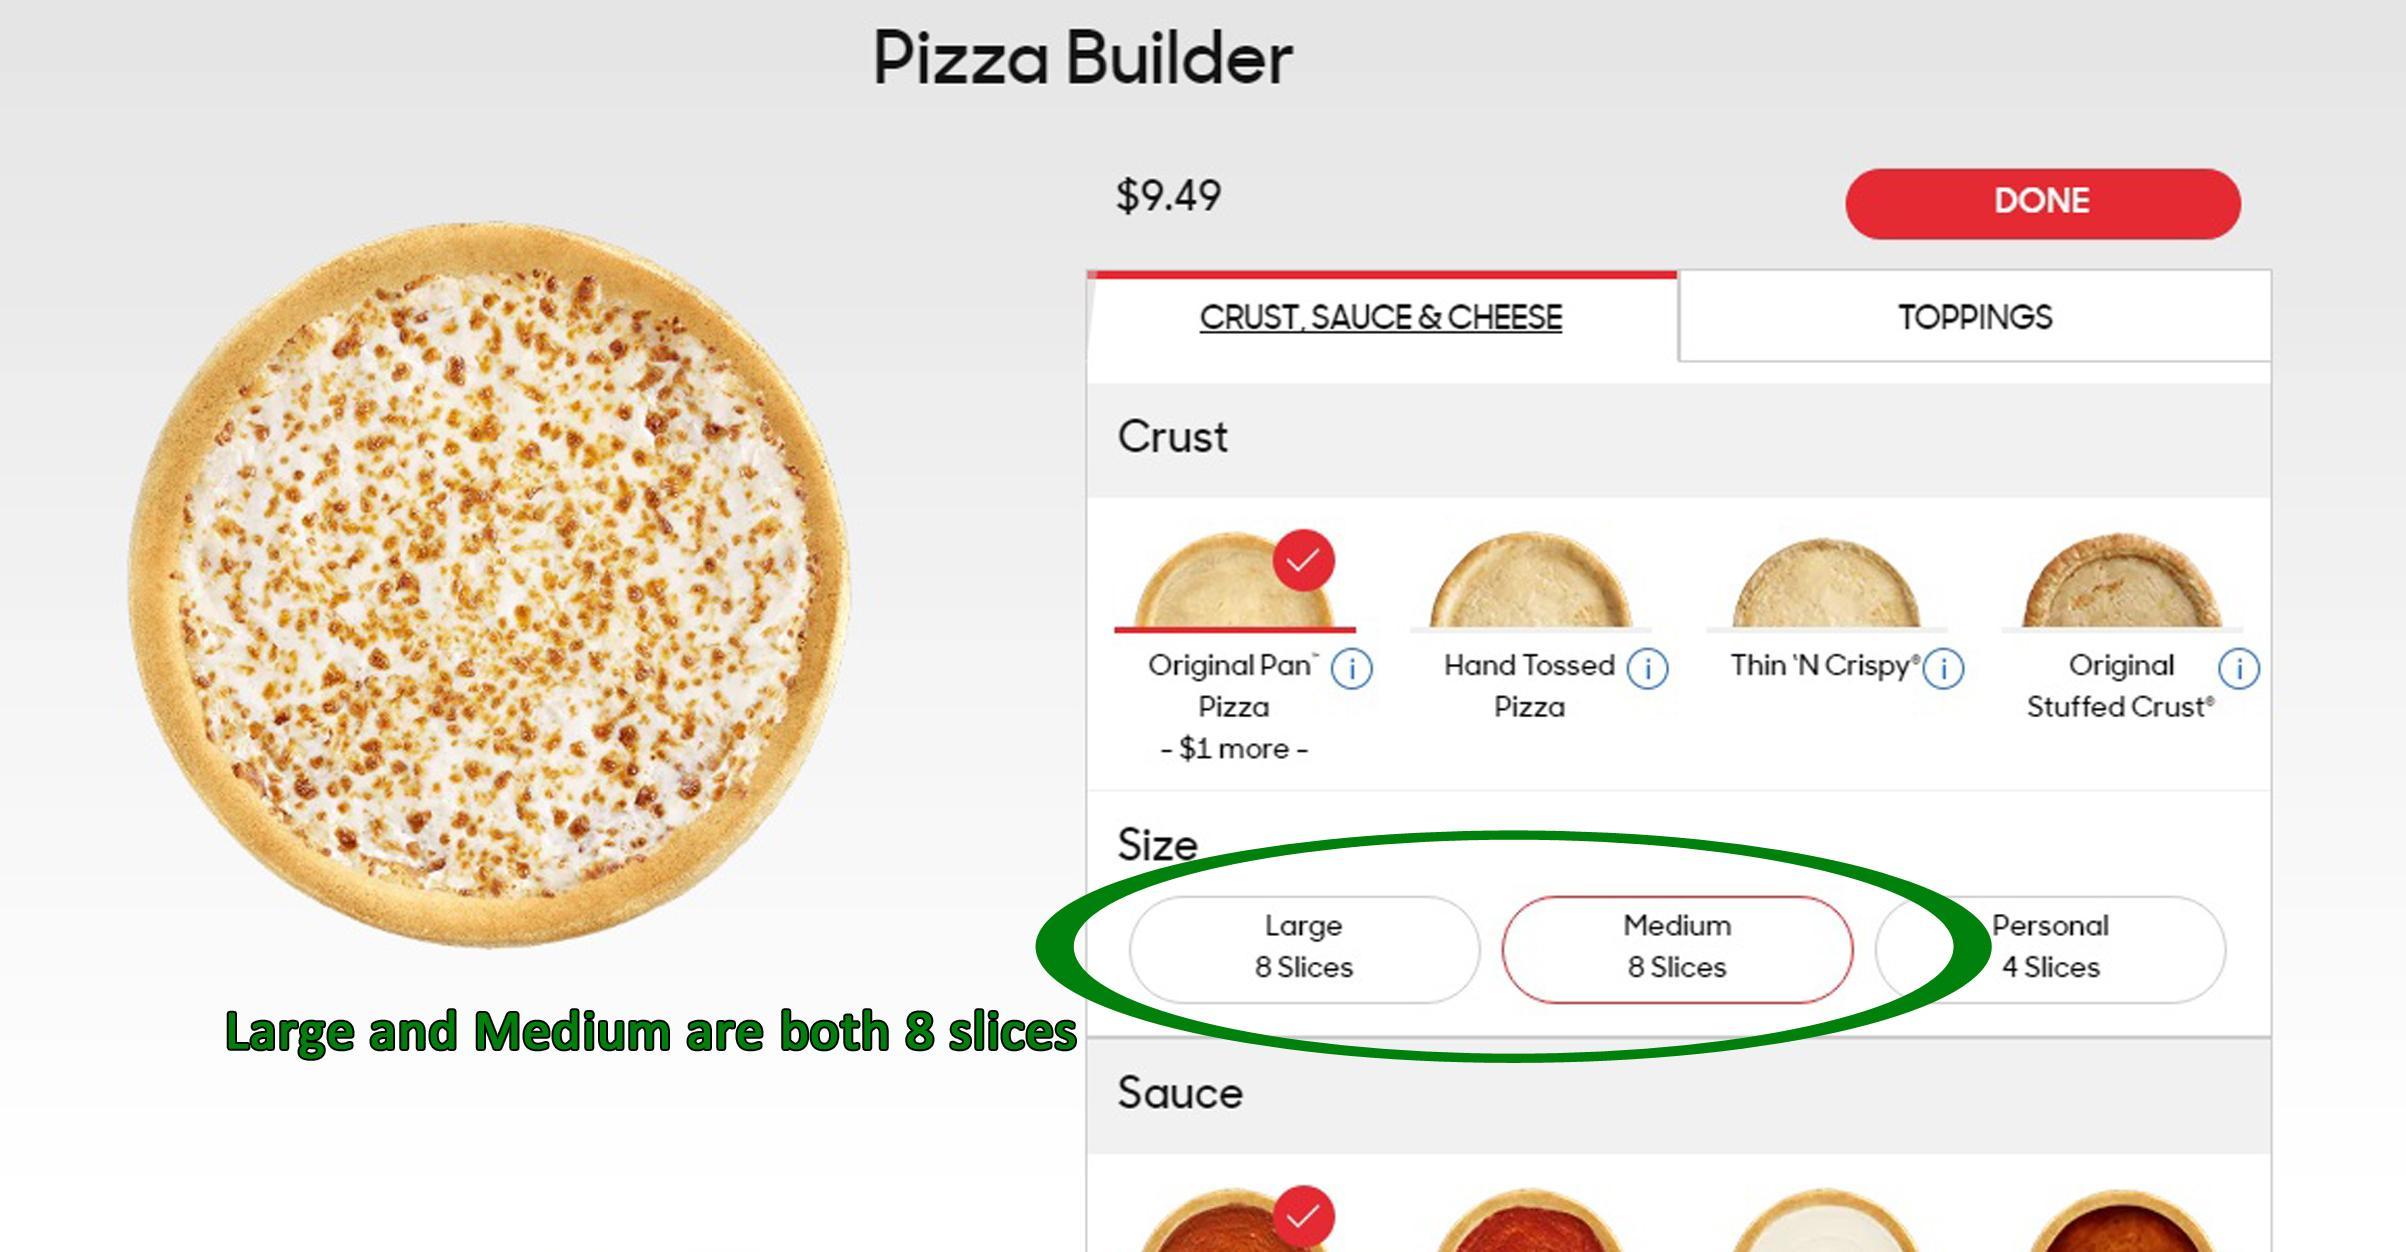 Pizza Hut Regular Pizza How Many Slices